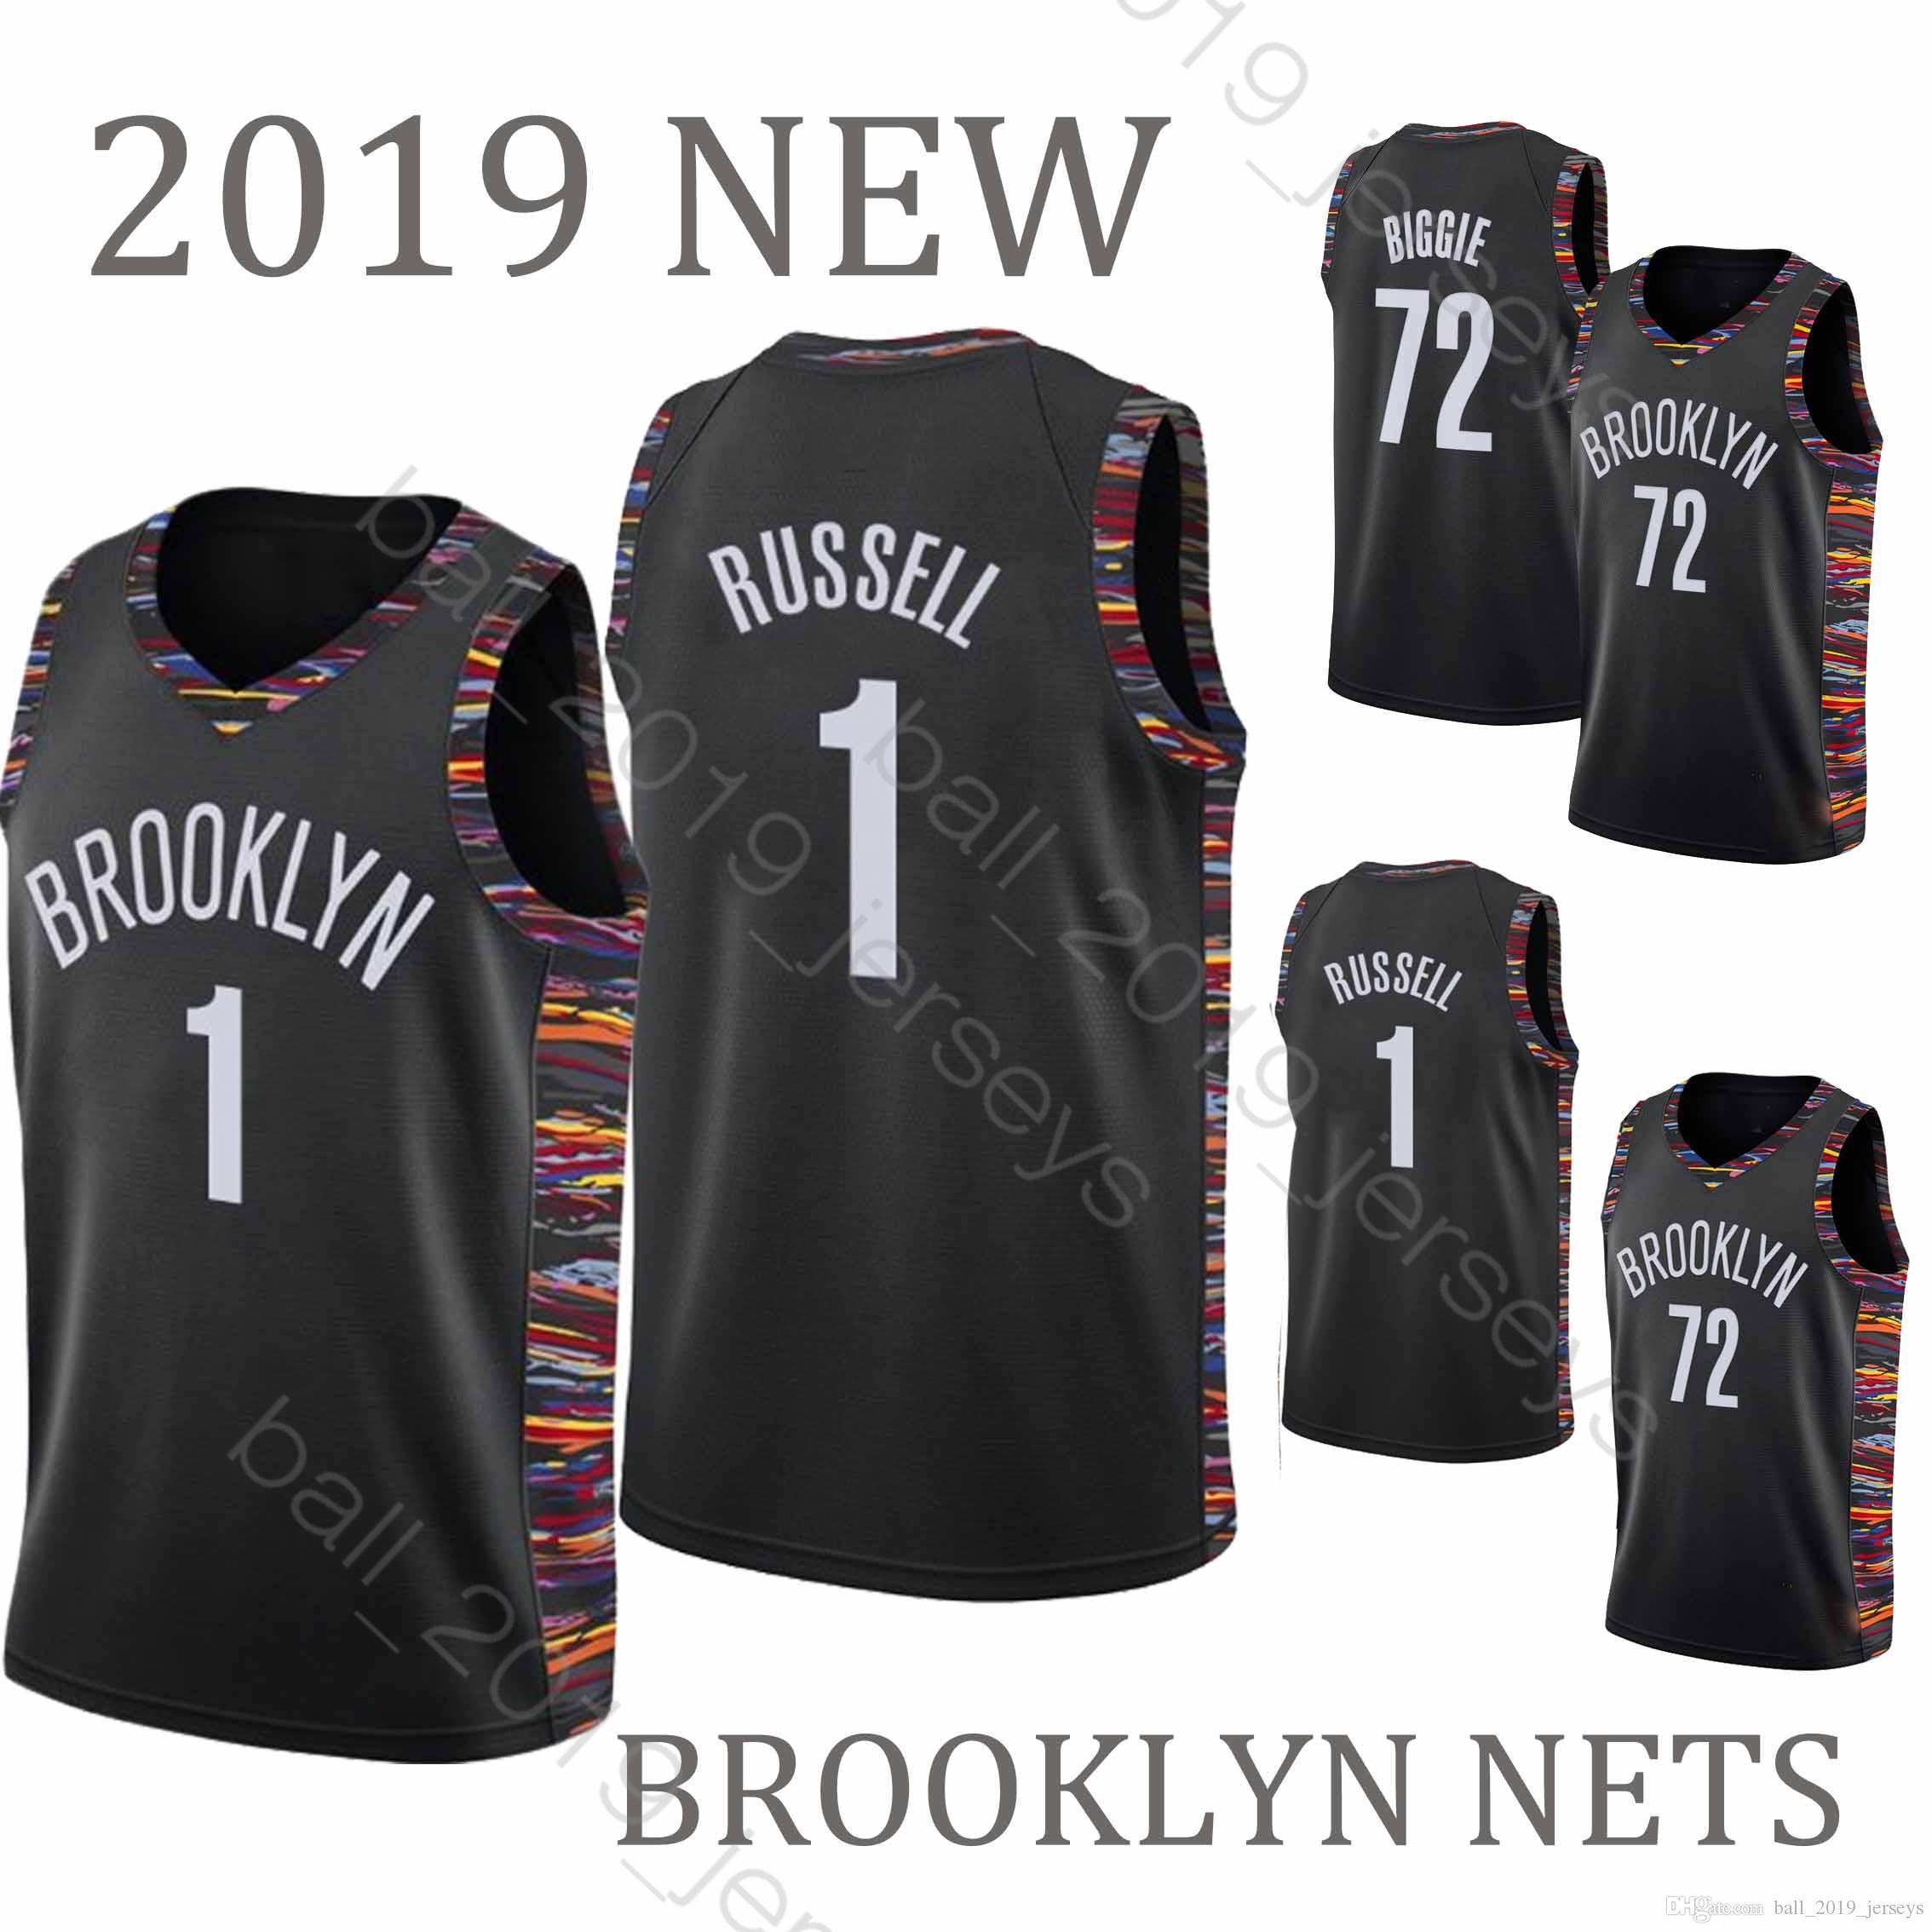 top design 2fc08 00b46 1 D'Angelo jersey Russell BROOKLYN 72 Black NETS Biggie jerseys 2019 new  HOT SALE Basketball Jerseys